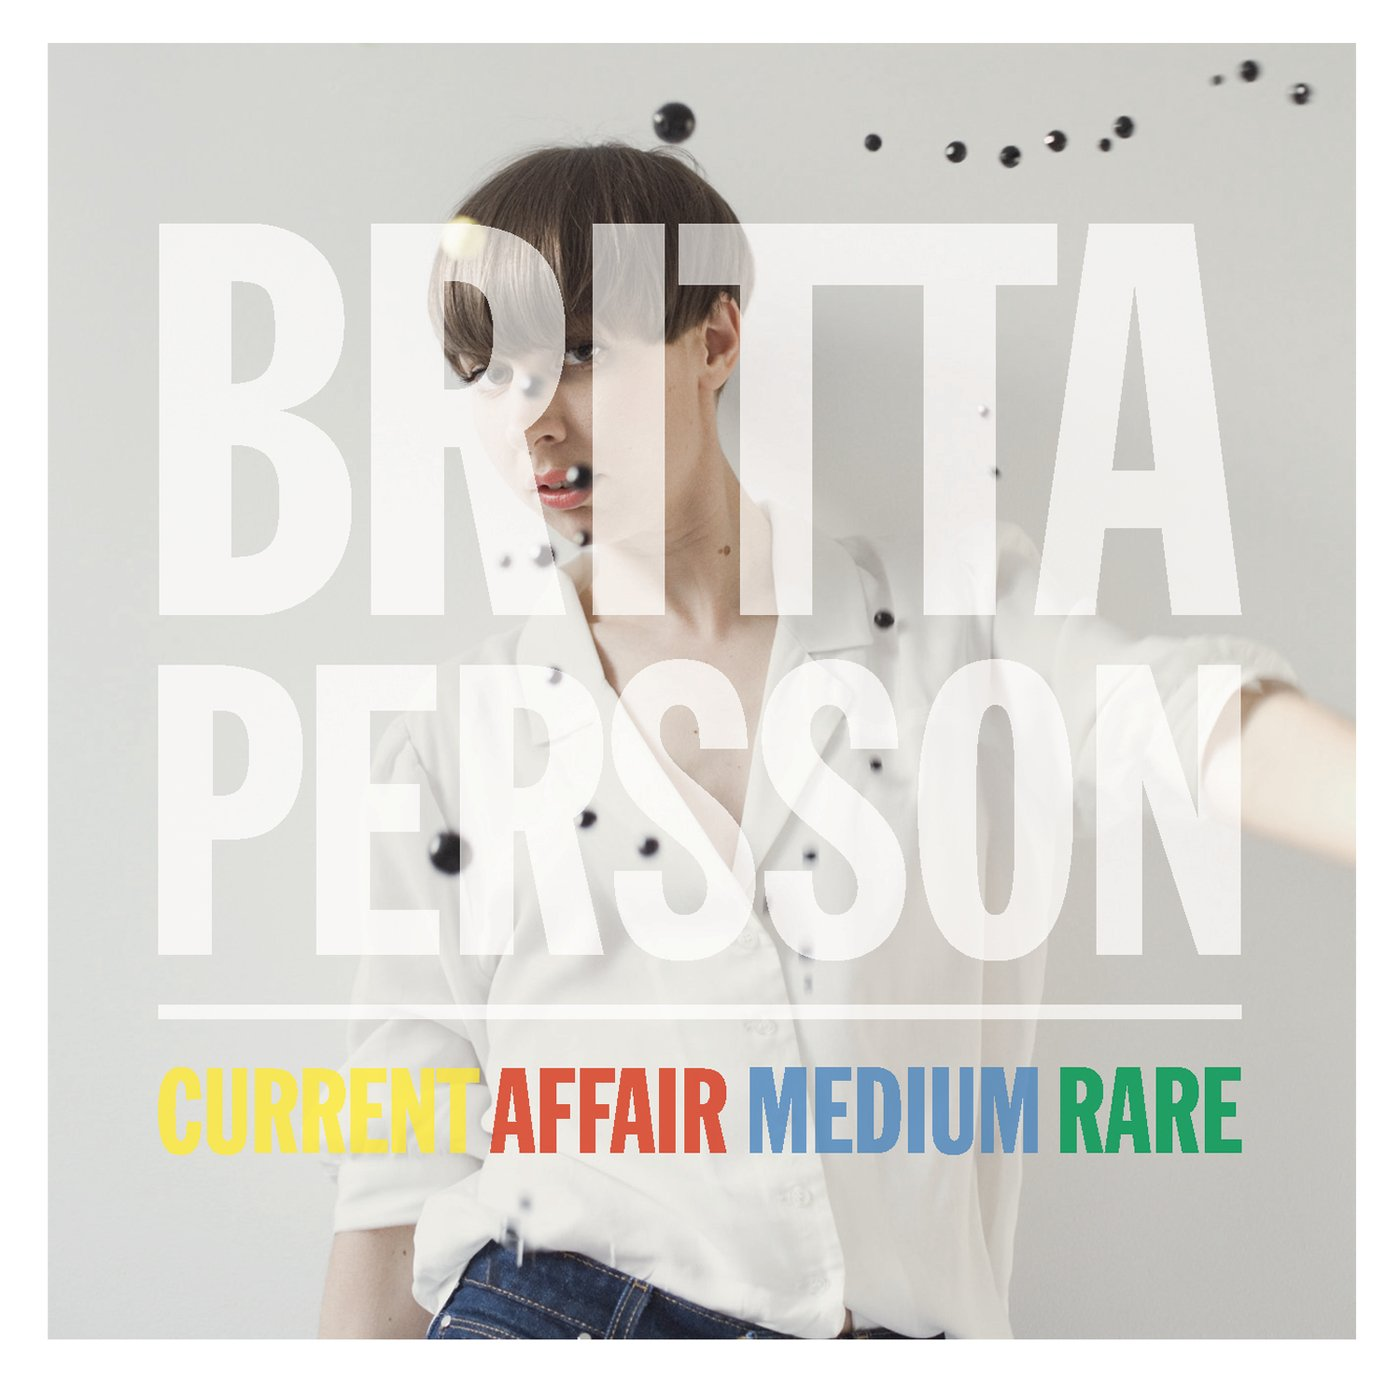 Britta Persson - Current Affair Medium Rare (2010) [FLAC] Download